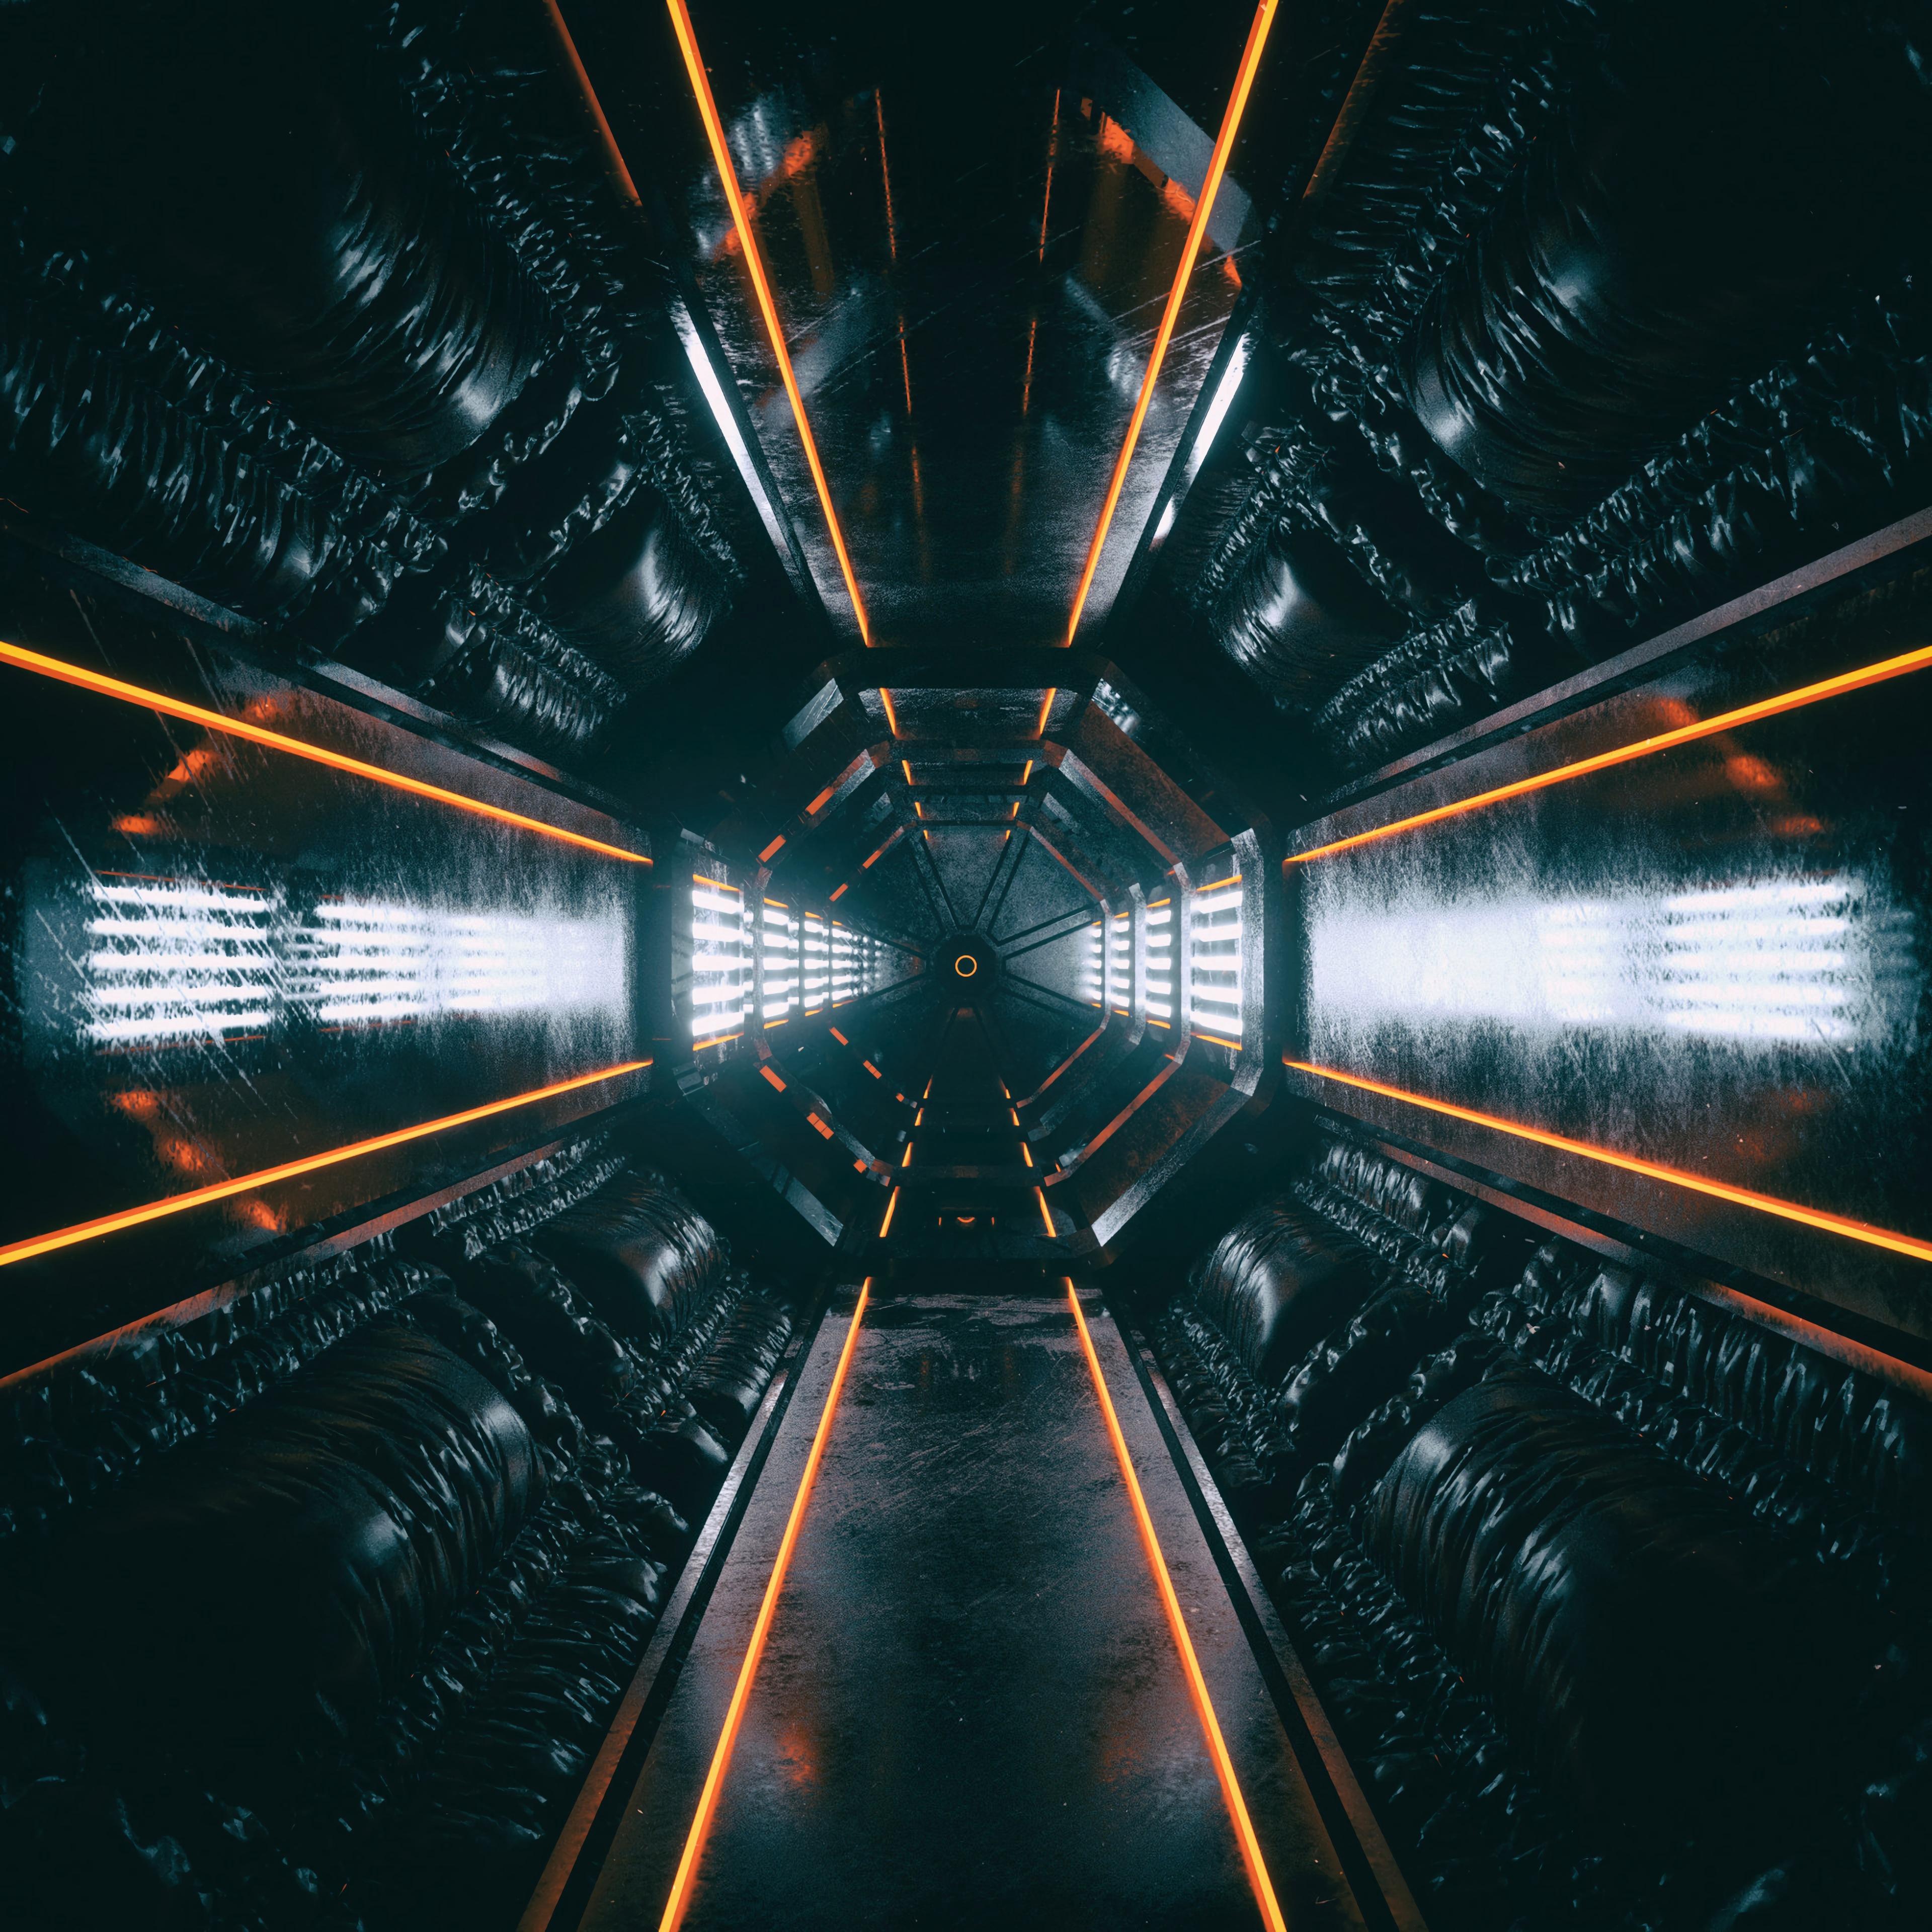 2560x1440 orirod space room glow 4k 1440p resolution hd 4k - 4k resolution space wallpaper ...